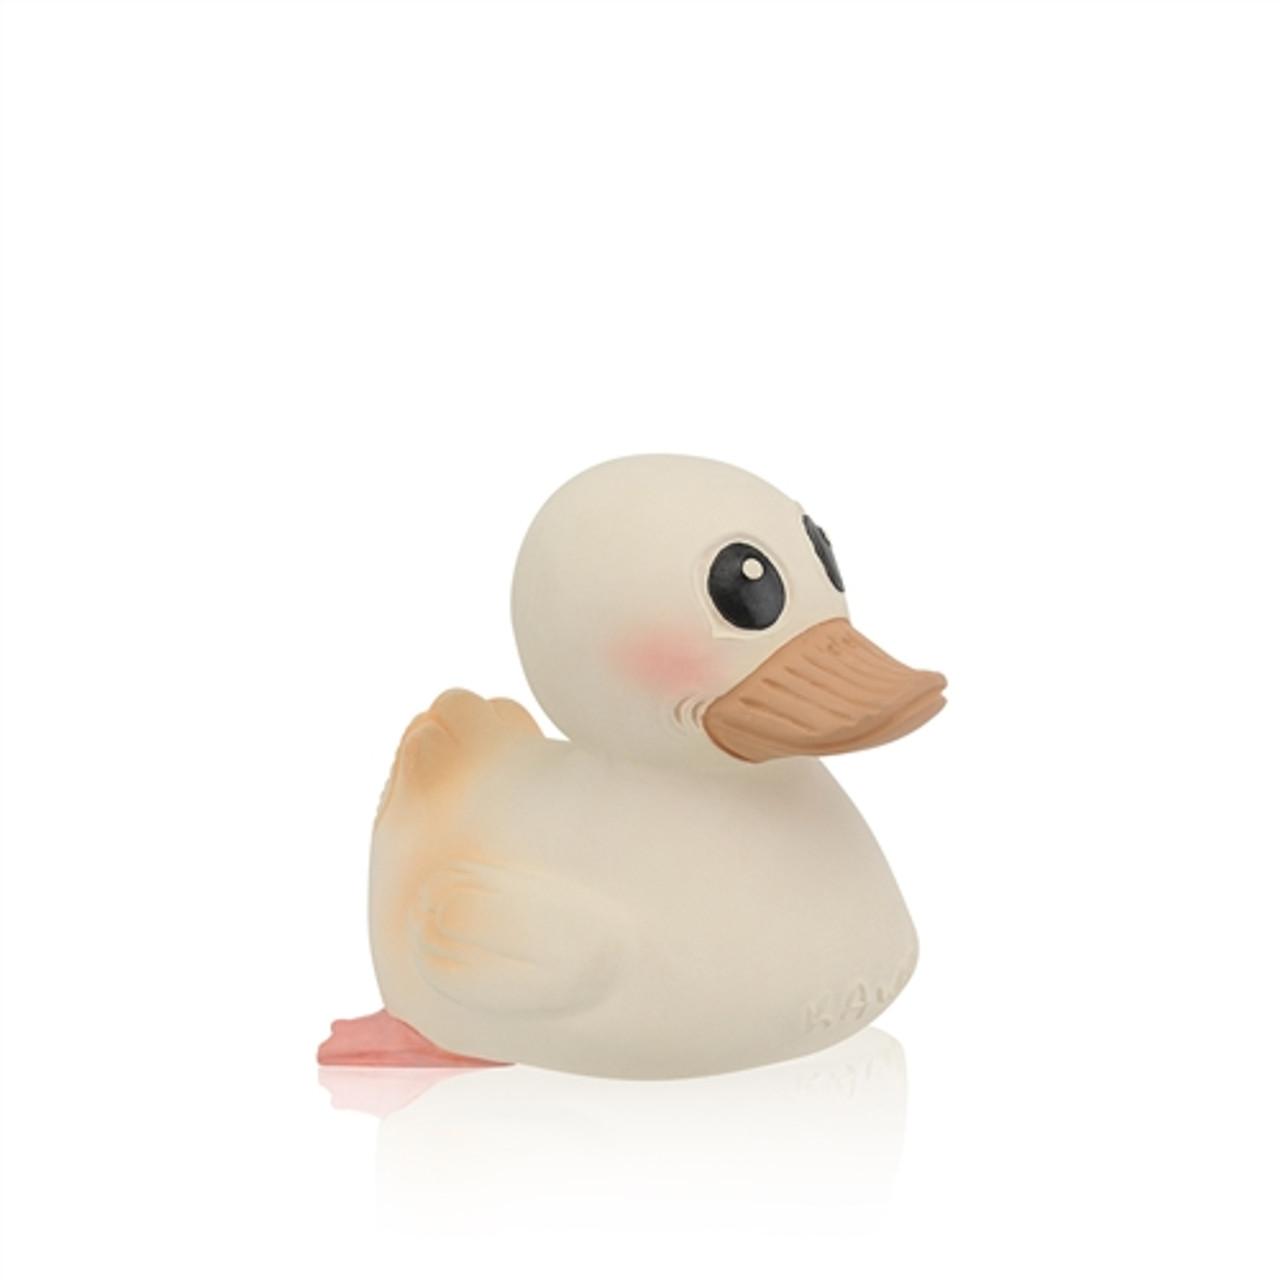 Sealed Rubber Duck Bath Toy - Mini White